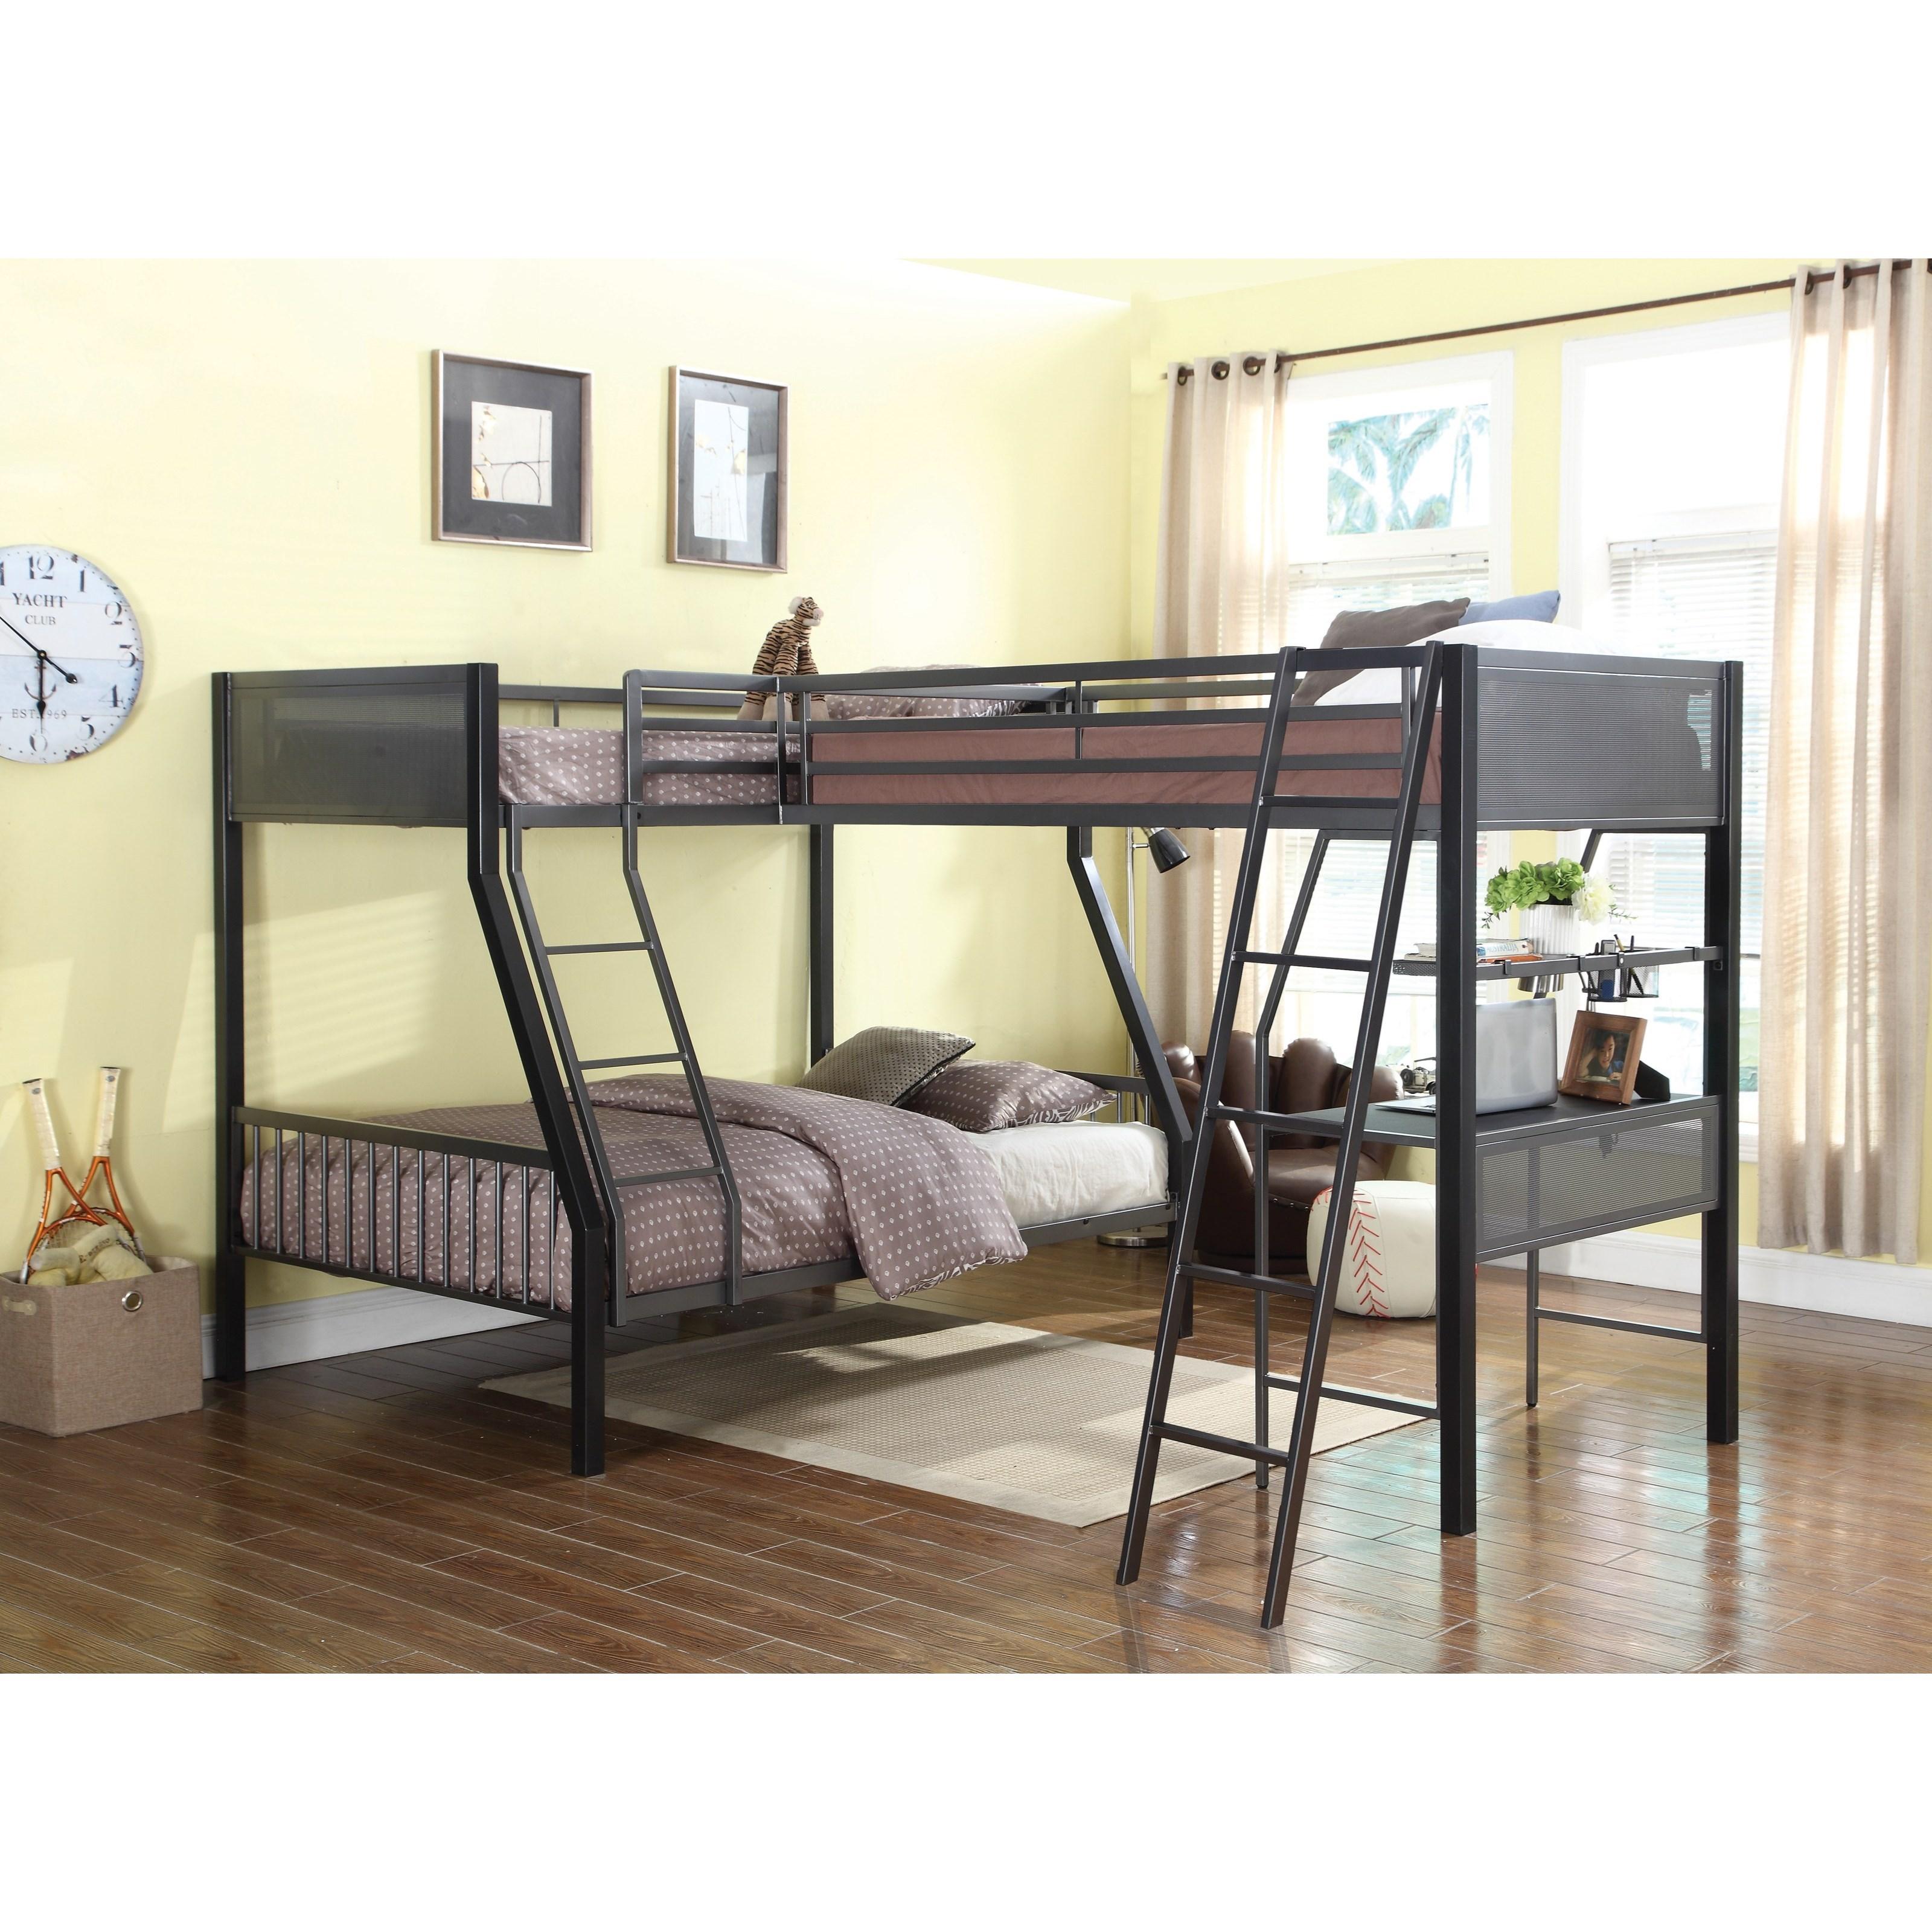 coaster bunks metal twin over full loft bunk bed with loft dunkbunks metal twin over full loft bunk bed with loft by coaster